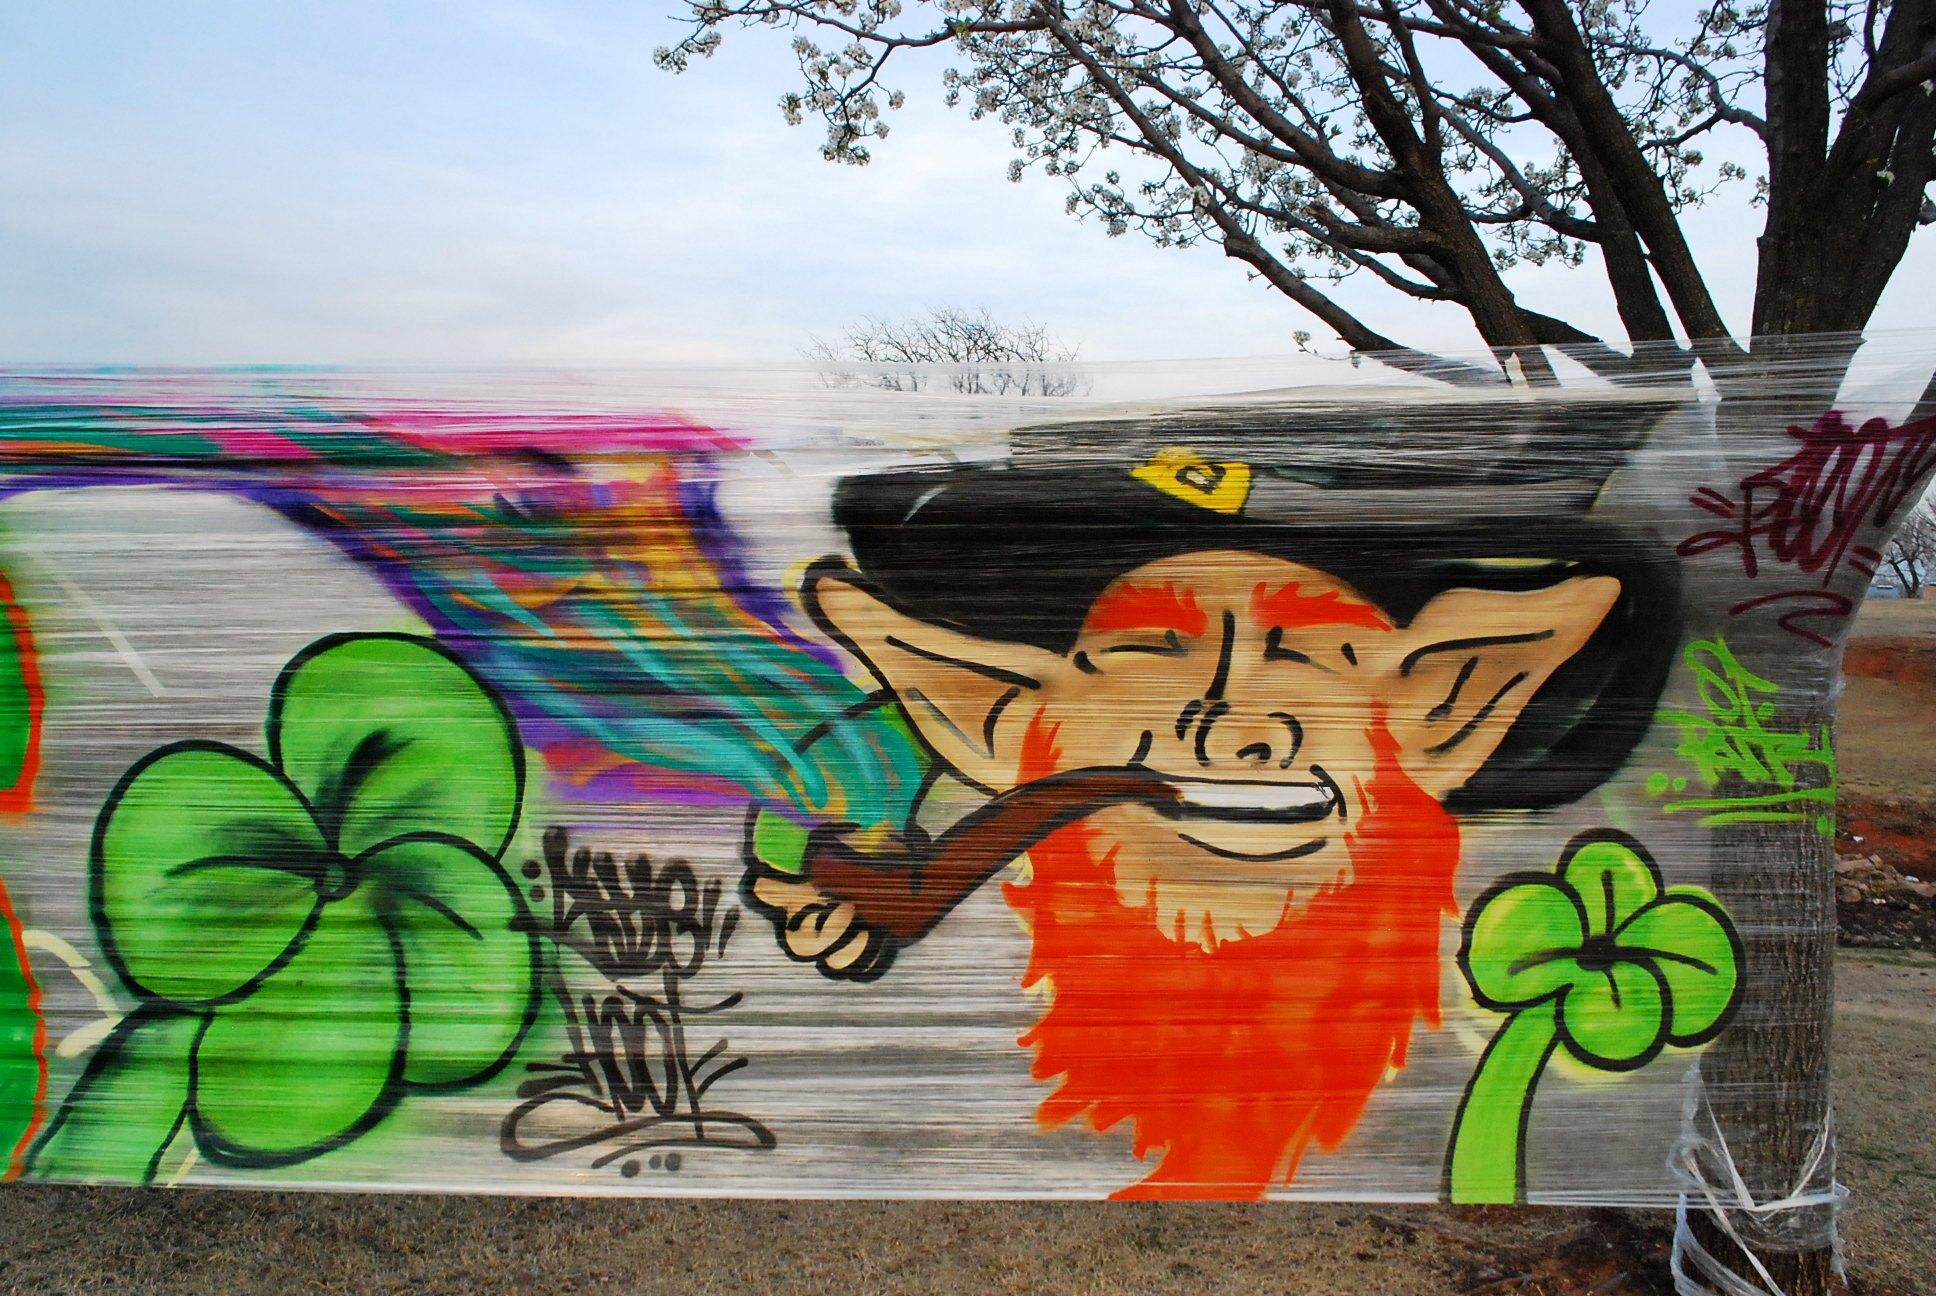 Saran Cellophane Graffiti